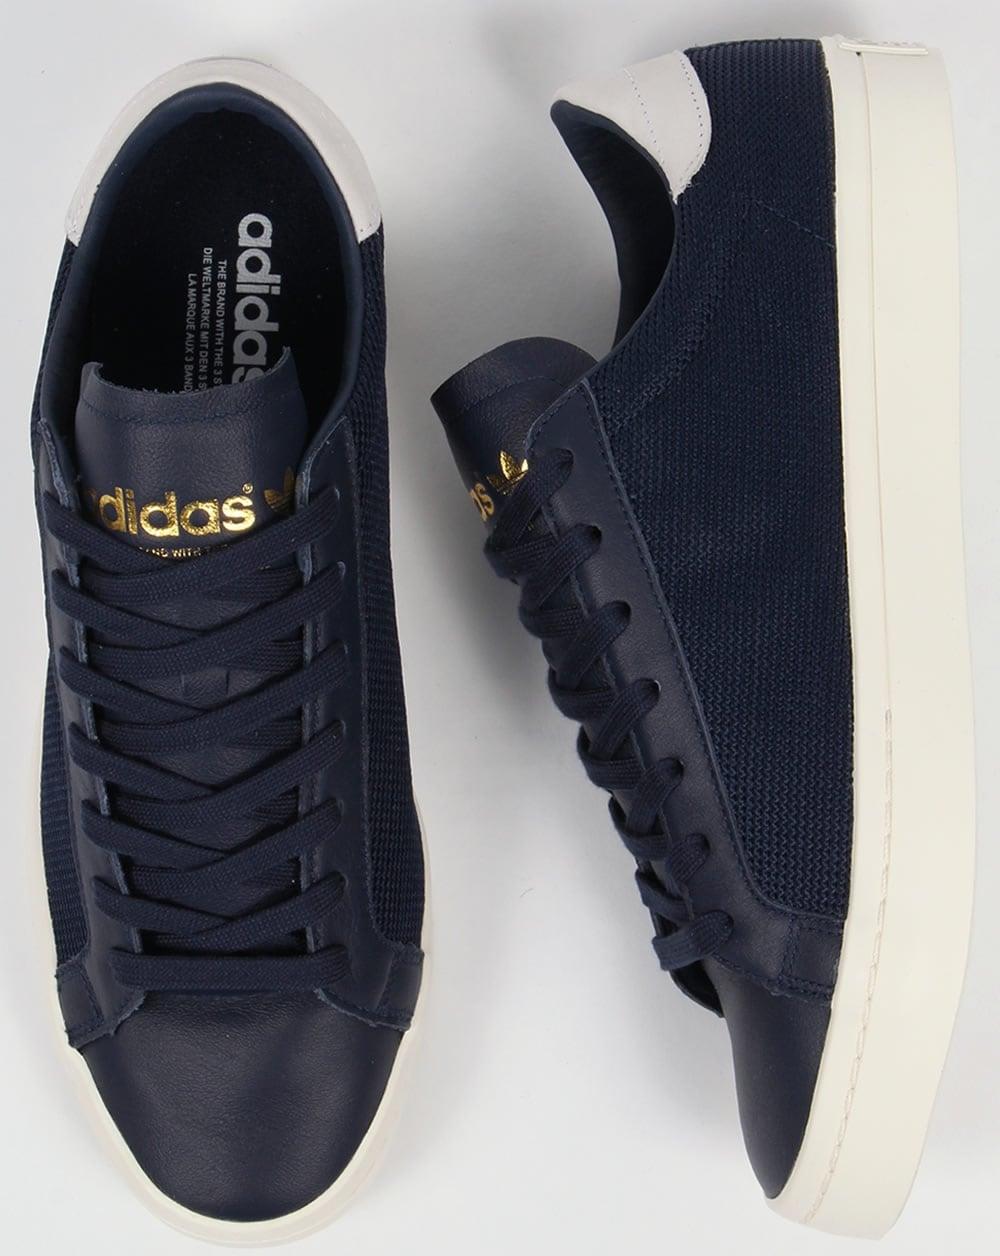 Blue Adidas Adidas Trace Blue Court Court Vantage Vantage Trace Court Adidas 4aqxHx75w